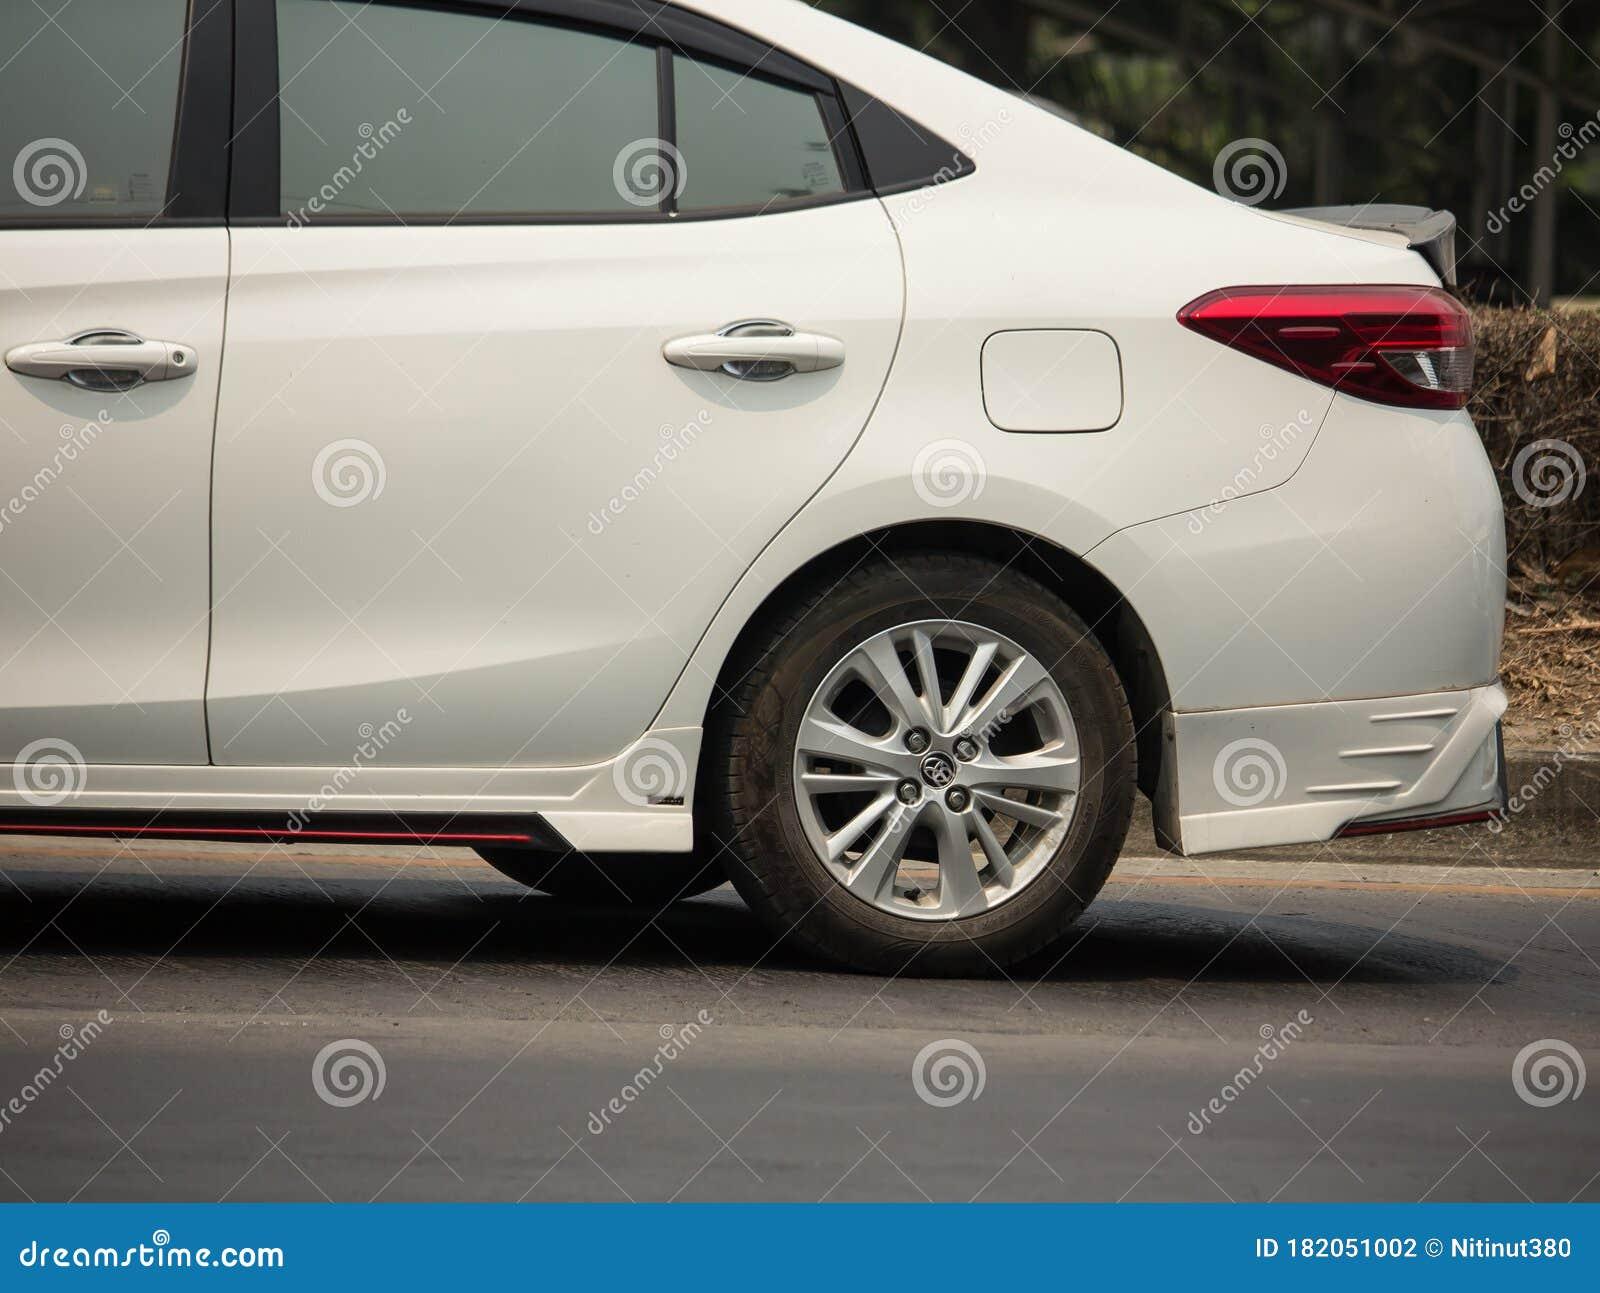 New Private Sedan Car Toyota Yaris Ativ Eco Car Editorial Photography Image Of Holiday Editorial 182051002